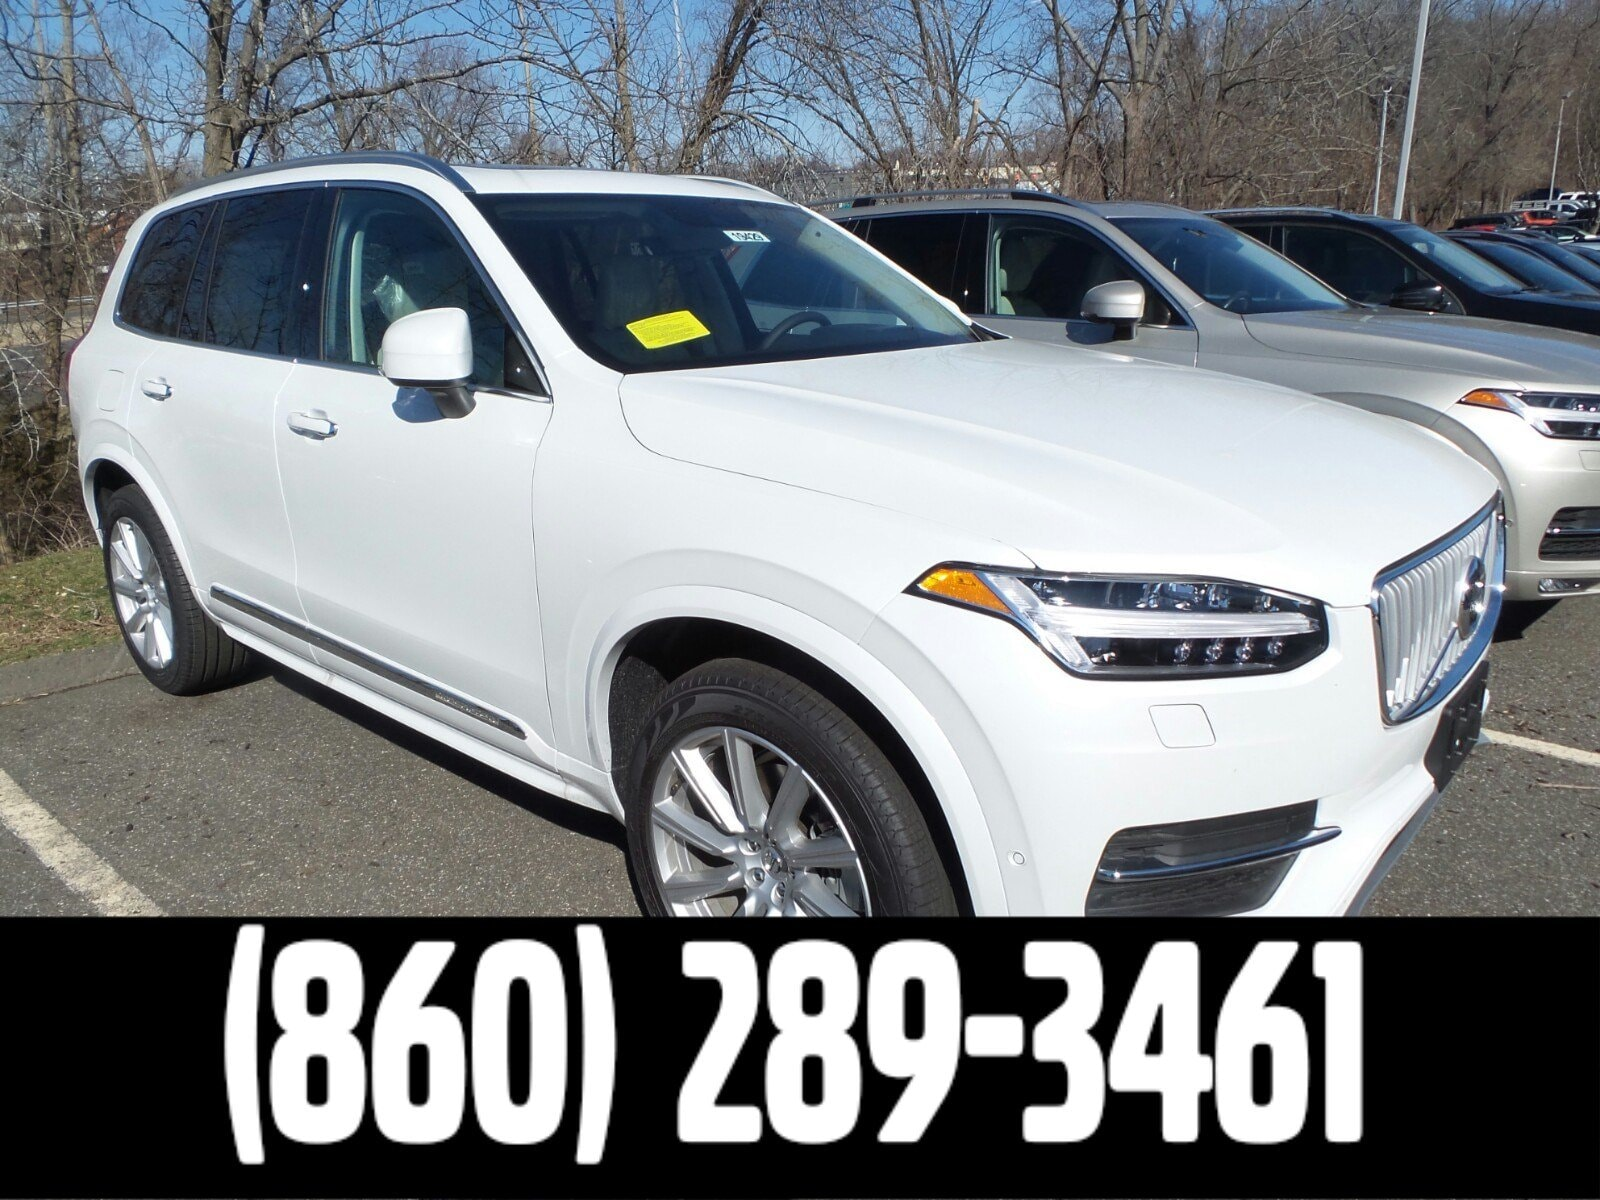 New 2019 Volvo XC90 For Sale Hartford CT | VIN:YV4A22PL5K1480251